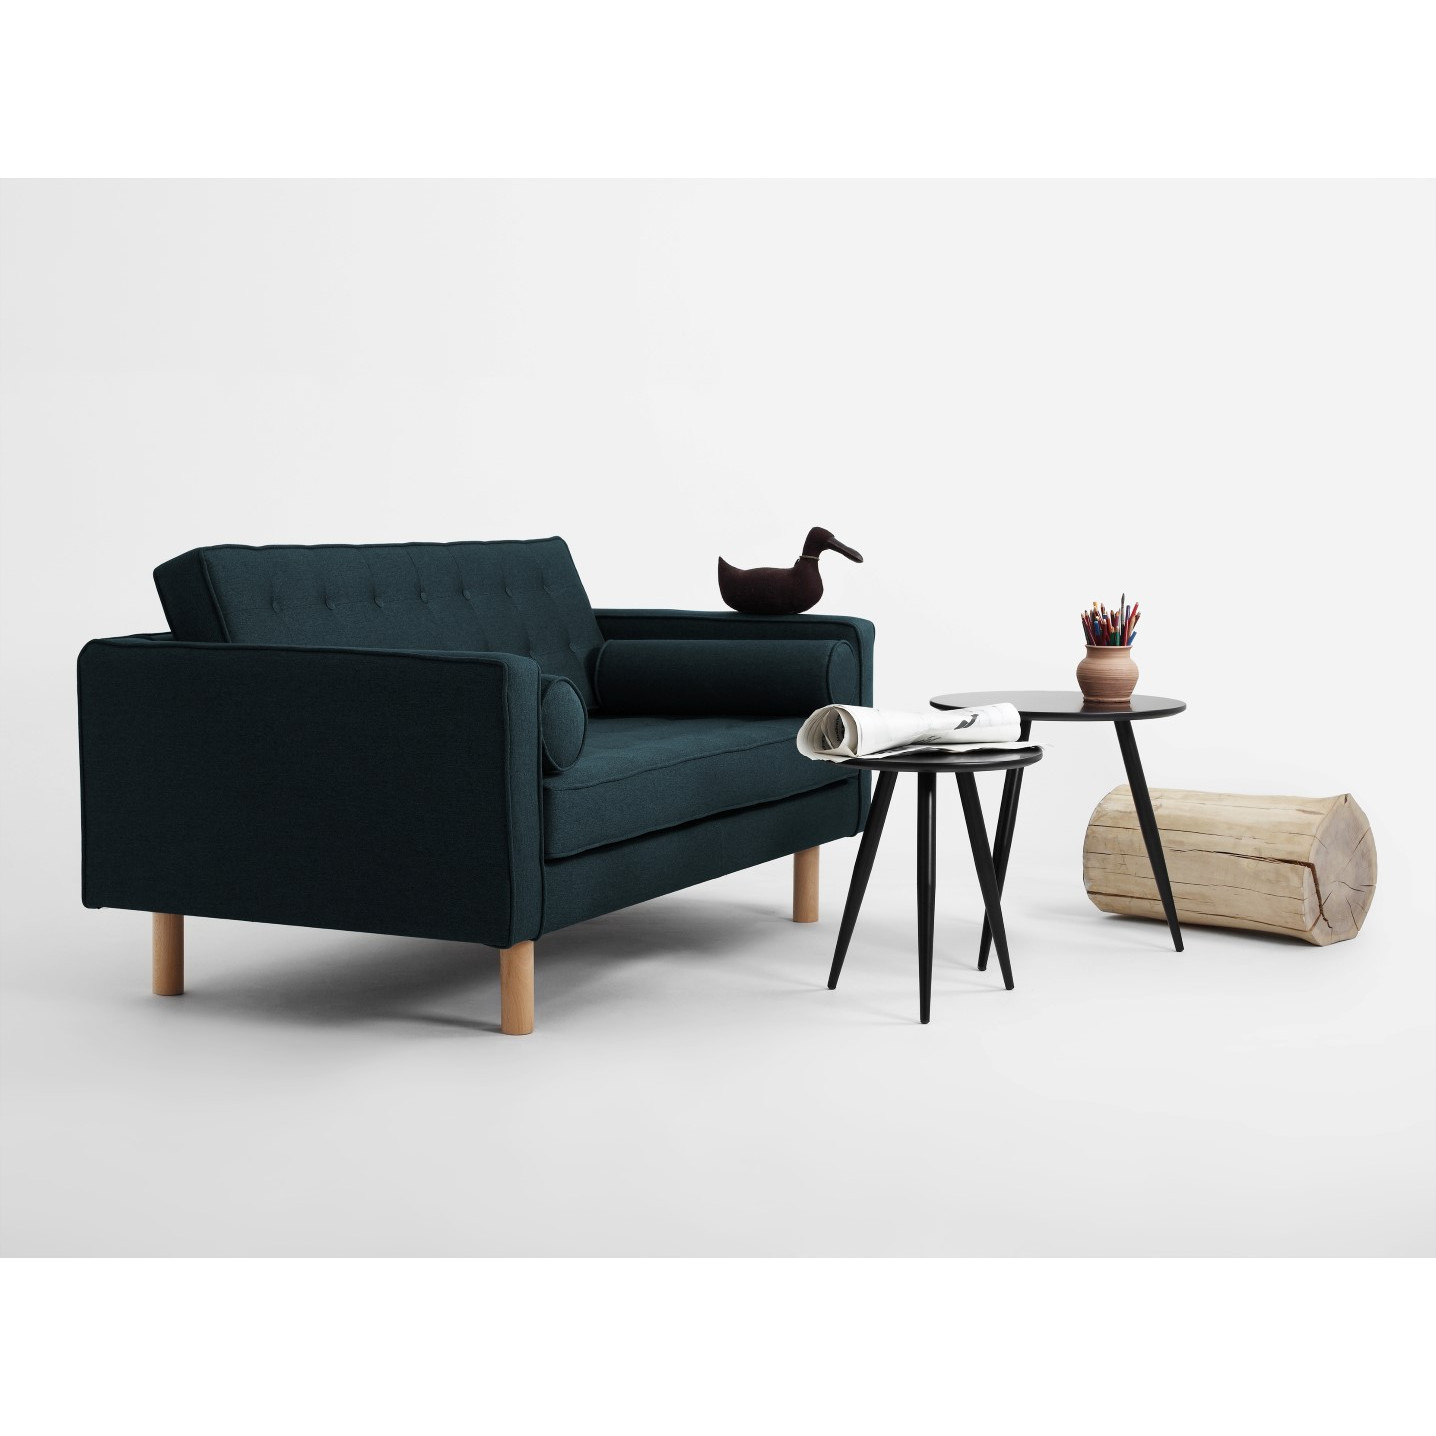 2 Seater Sofa Topic Wood   Deep Sea